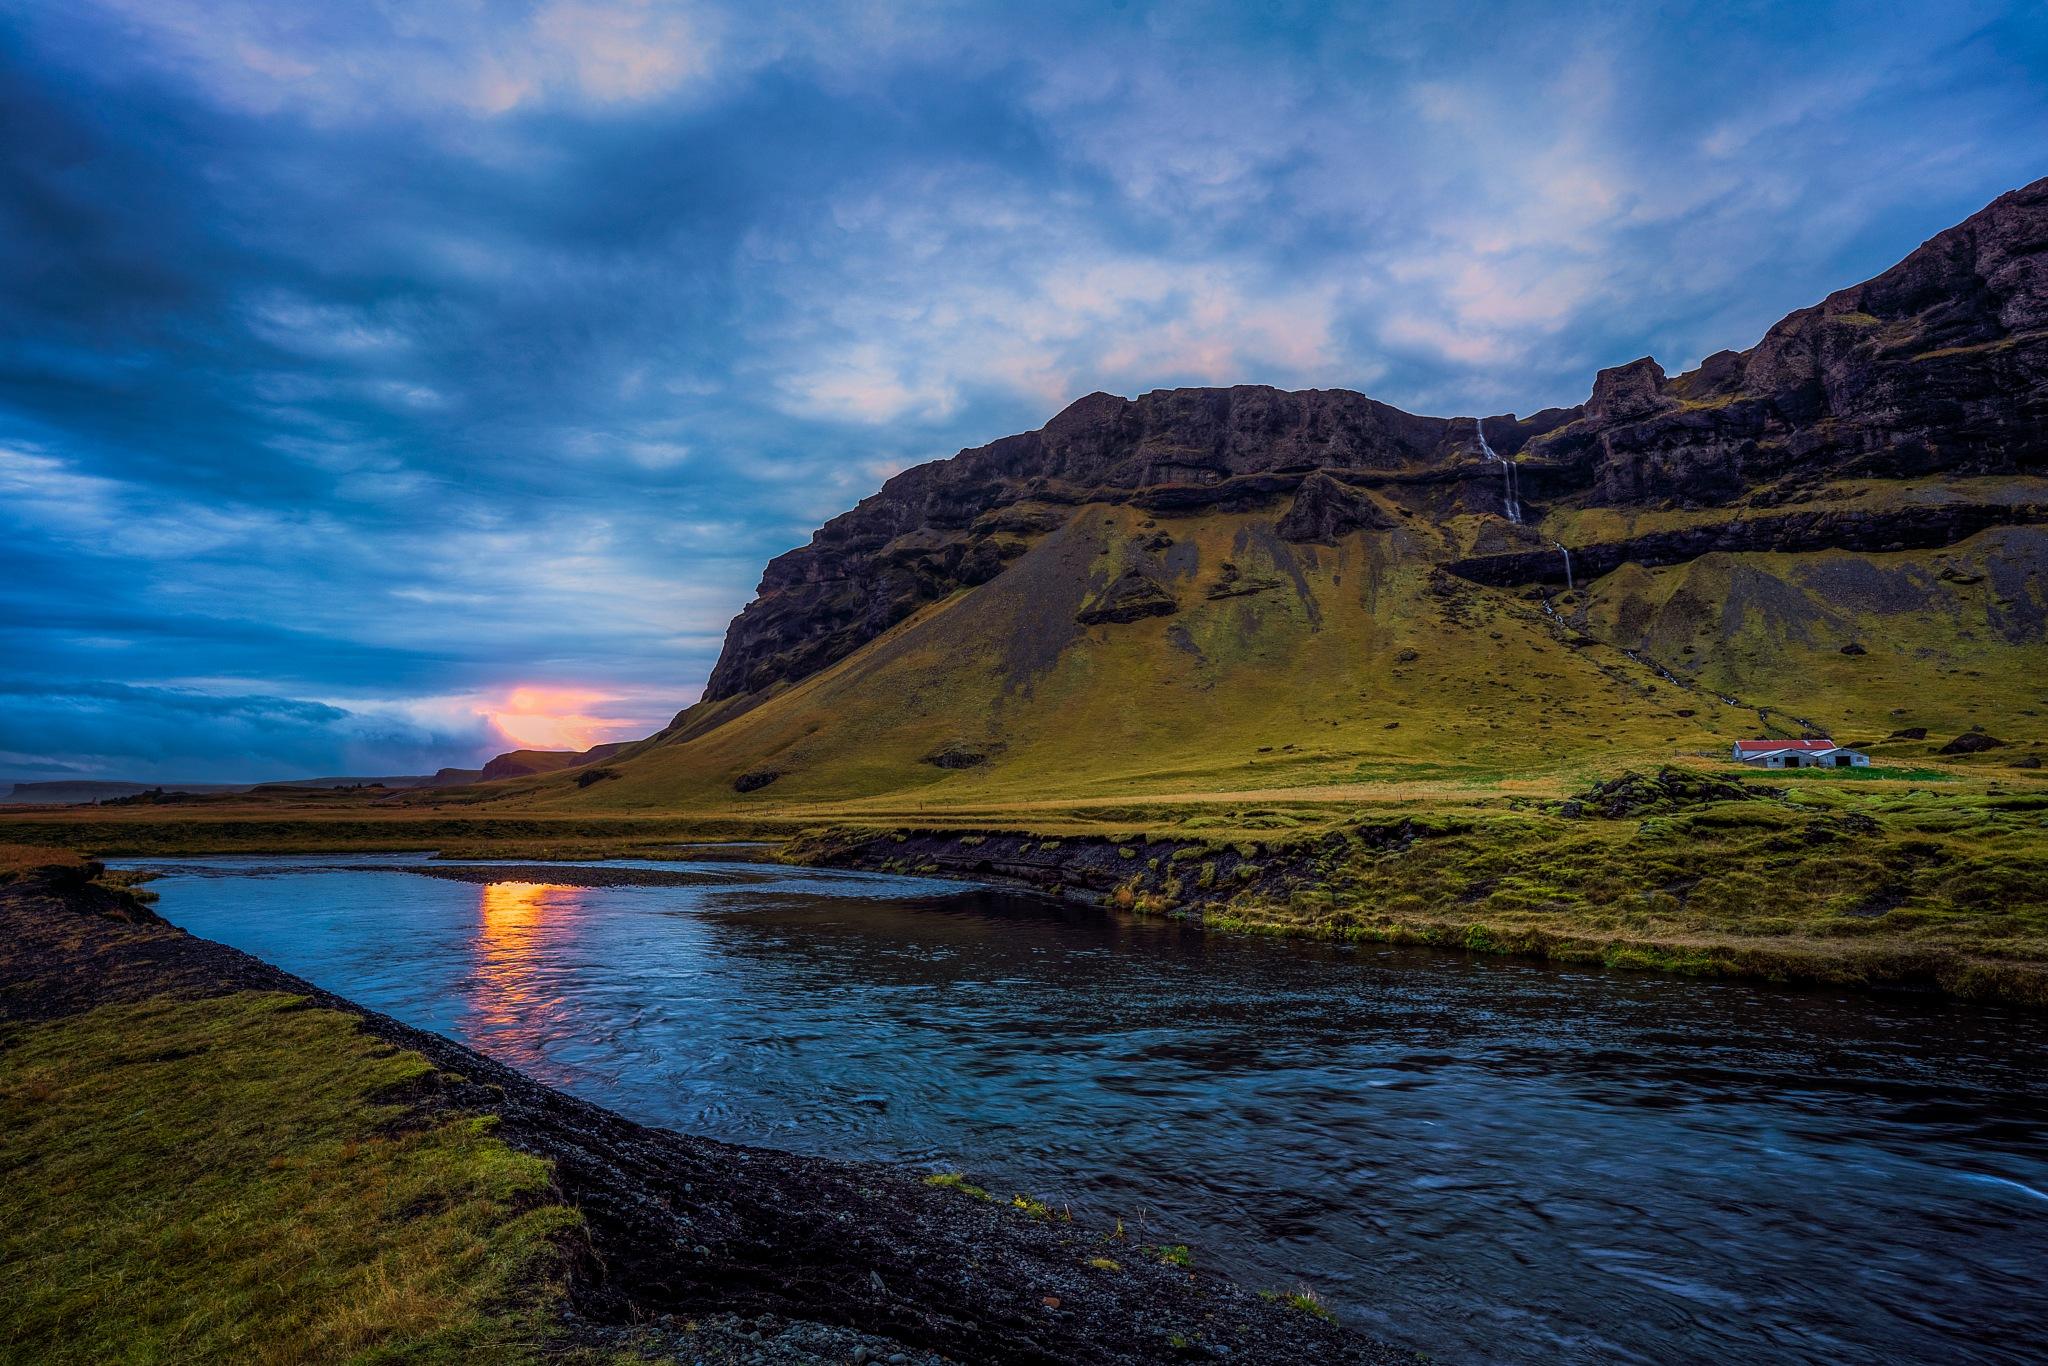 Iceland sunset by molinaadavid